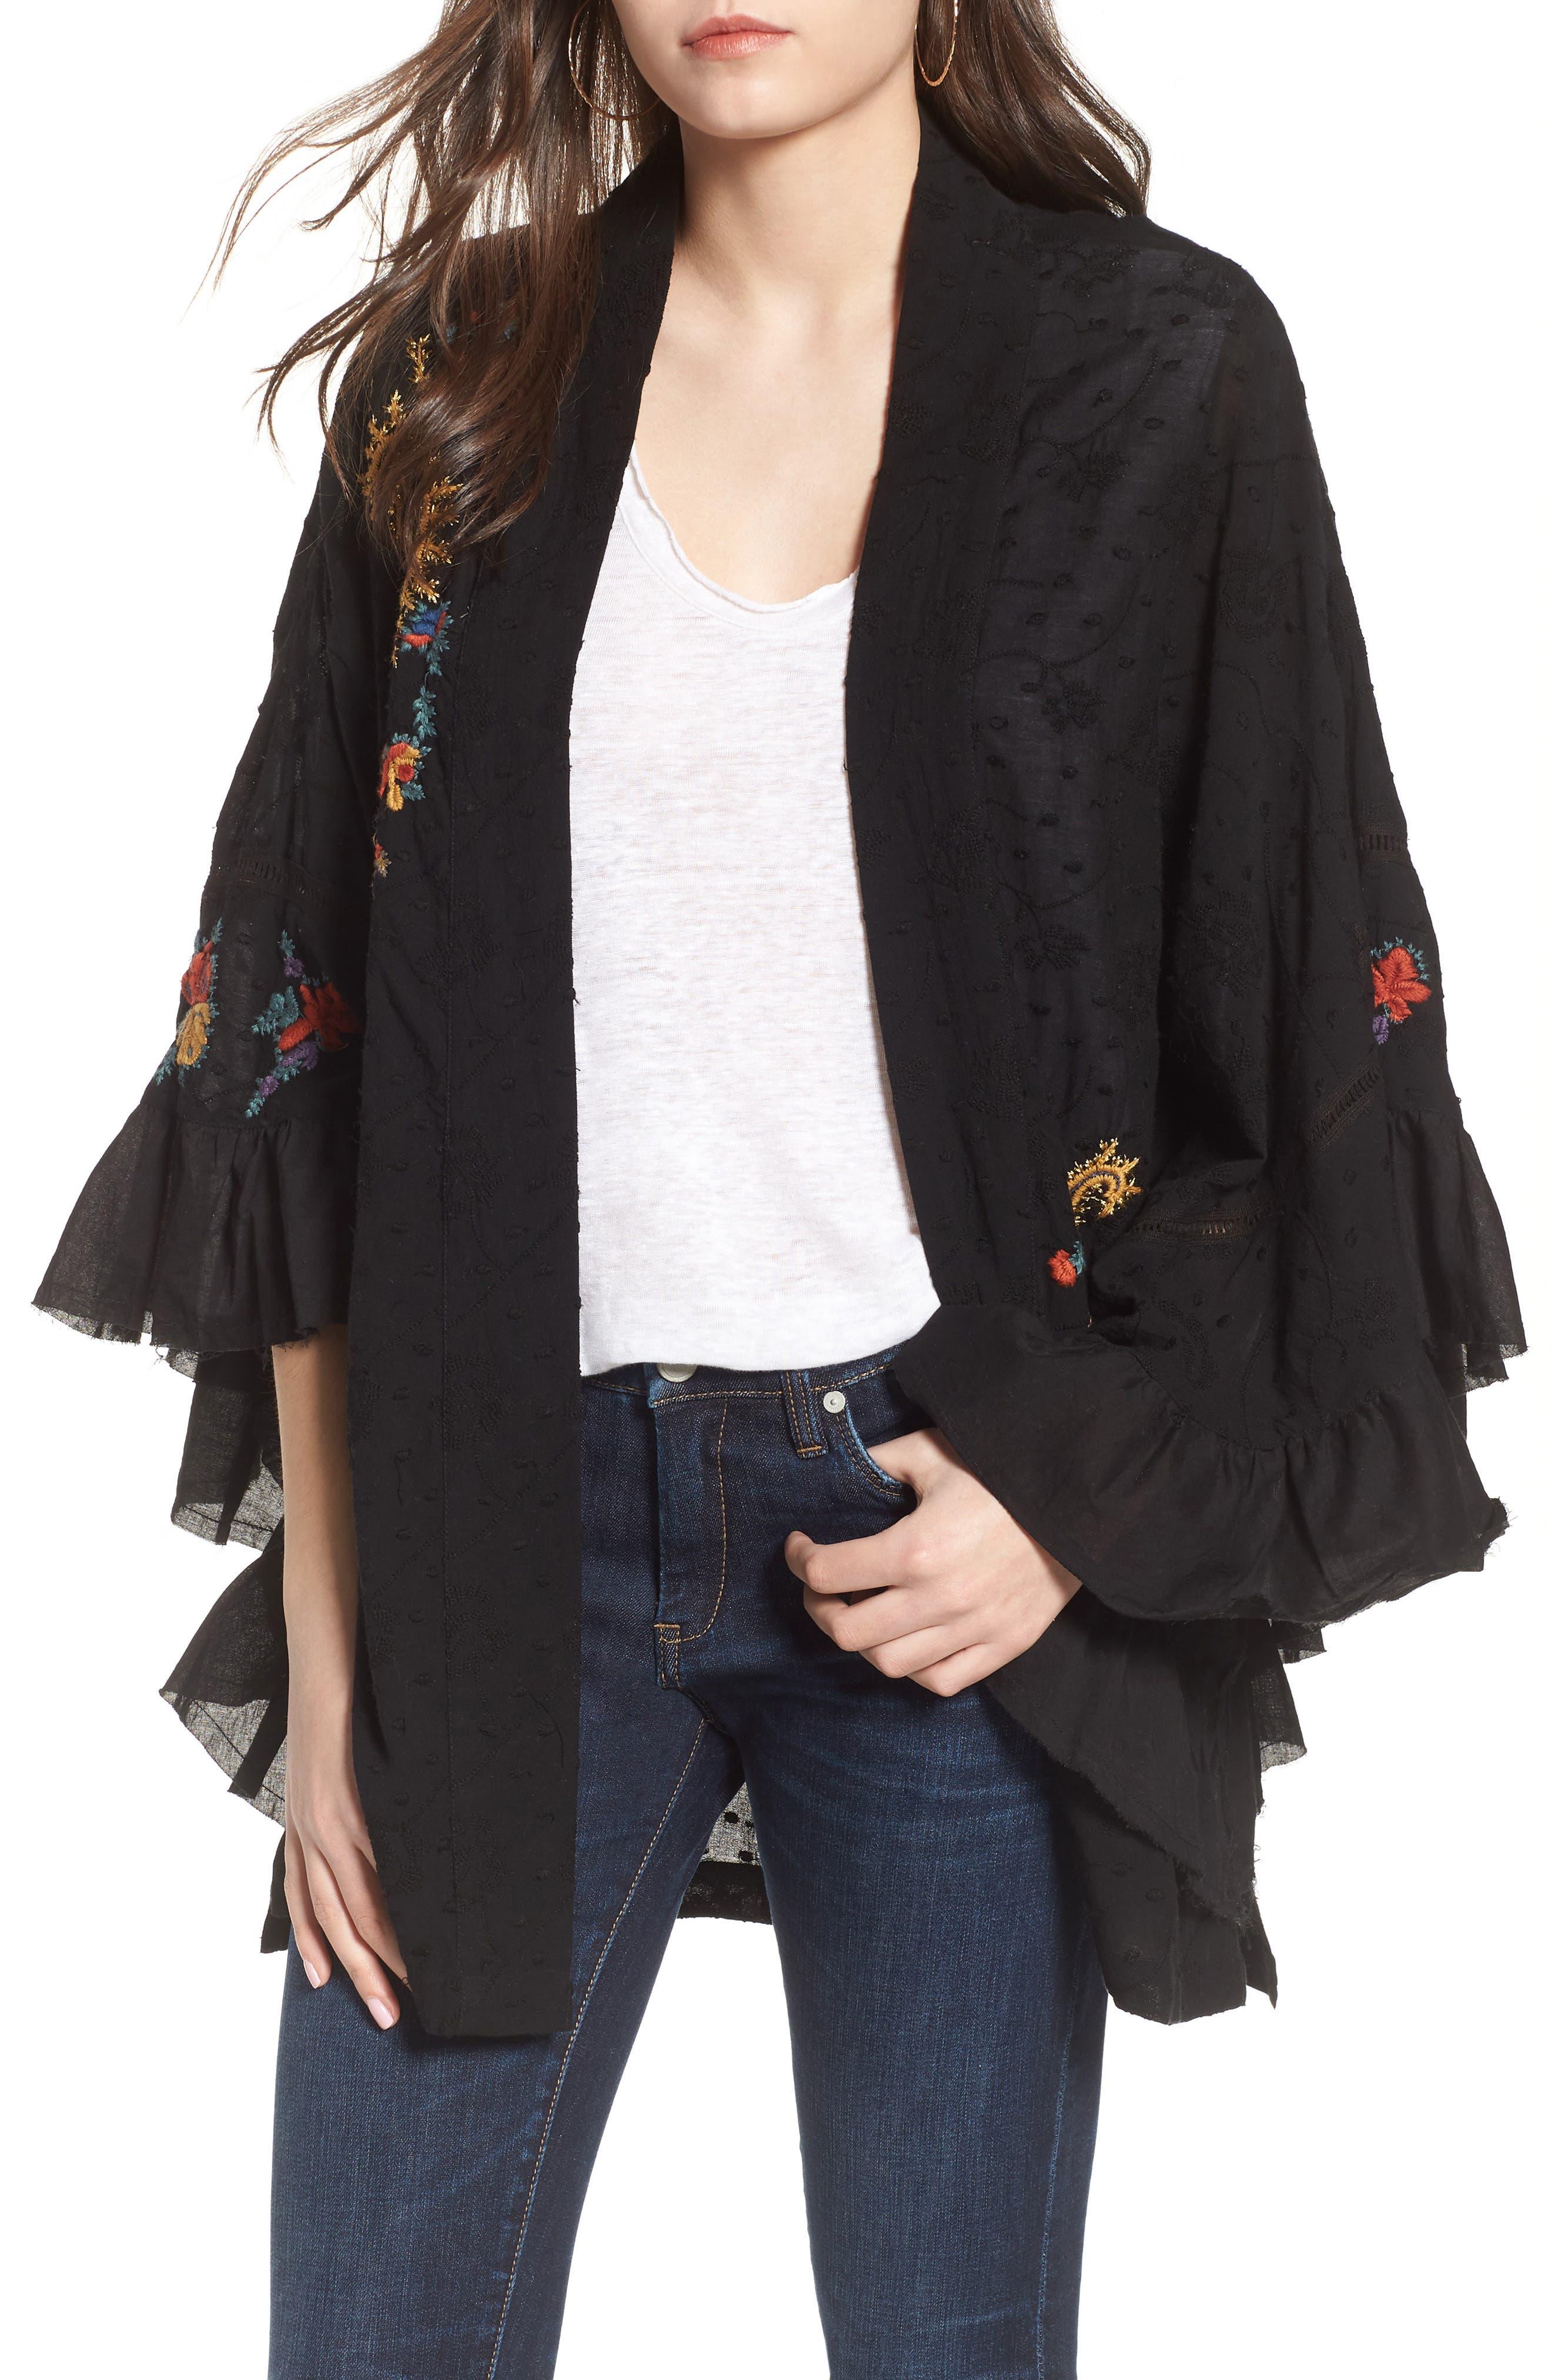 Dottie West Kimono,                         Main,                         color, BLACK